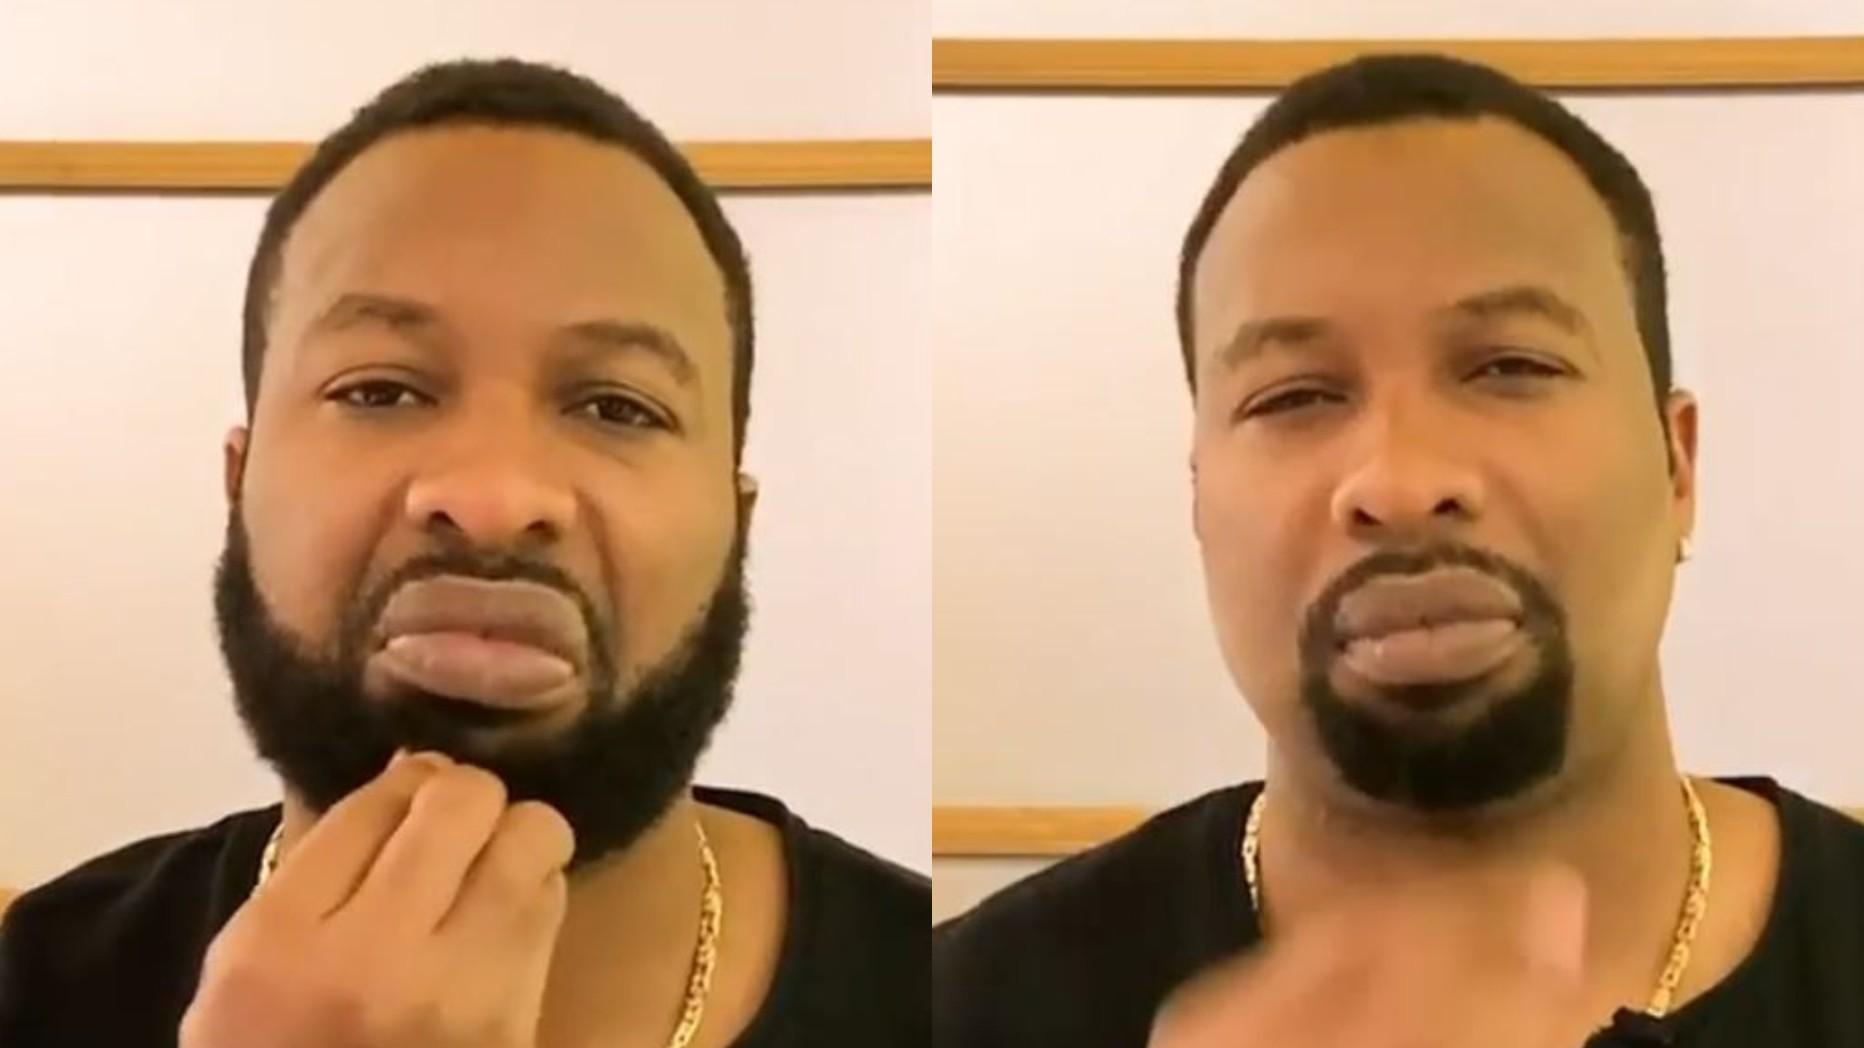 IPL 2020: Kieron Pollard takes 'brother' Hardik Pandya's cue, participates in break the beard challenge